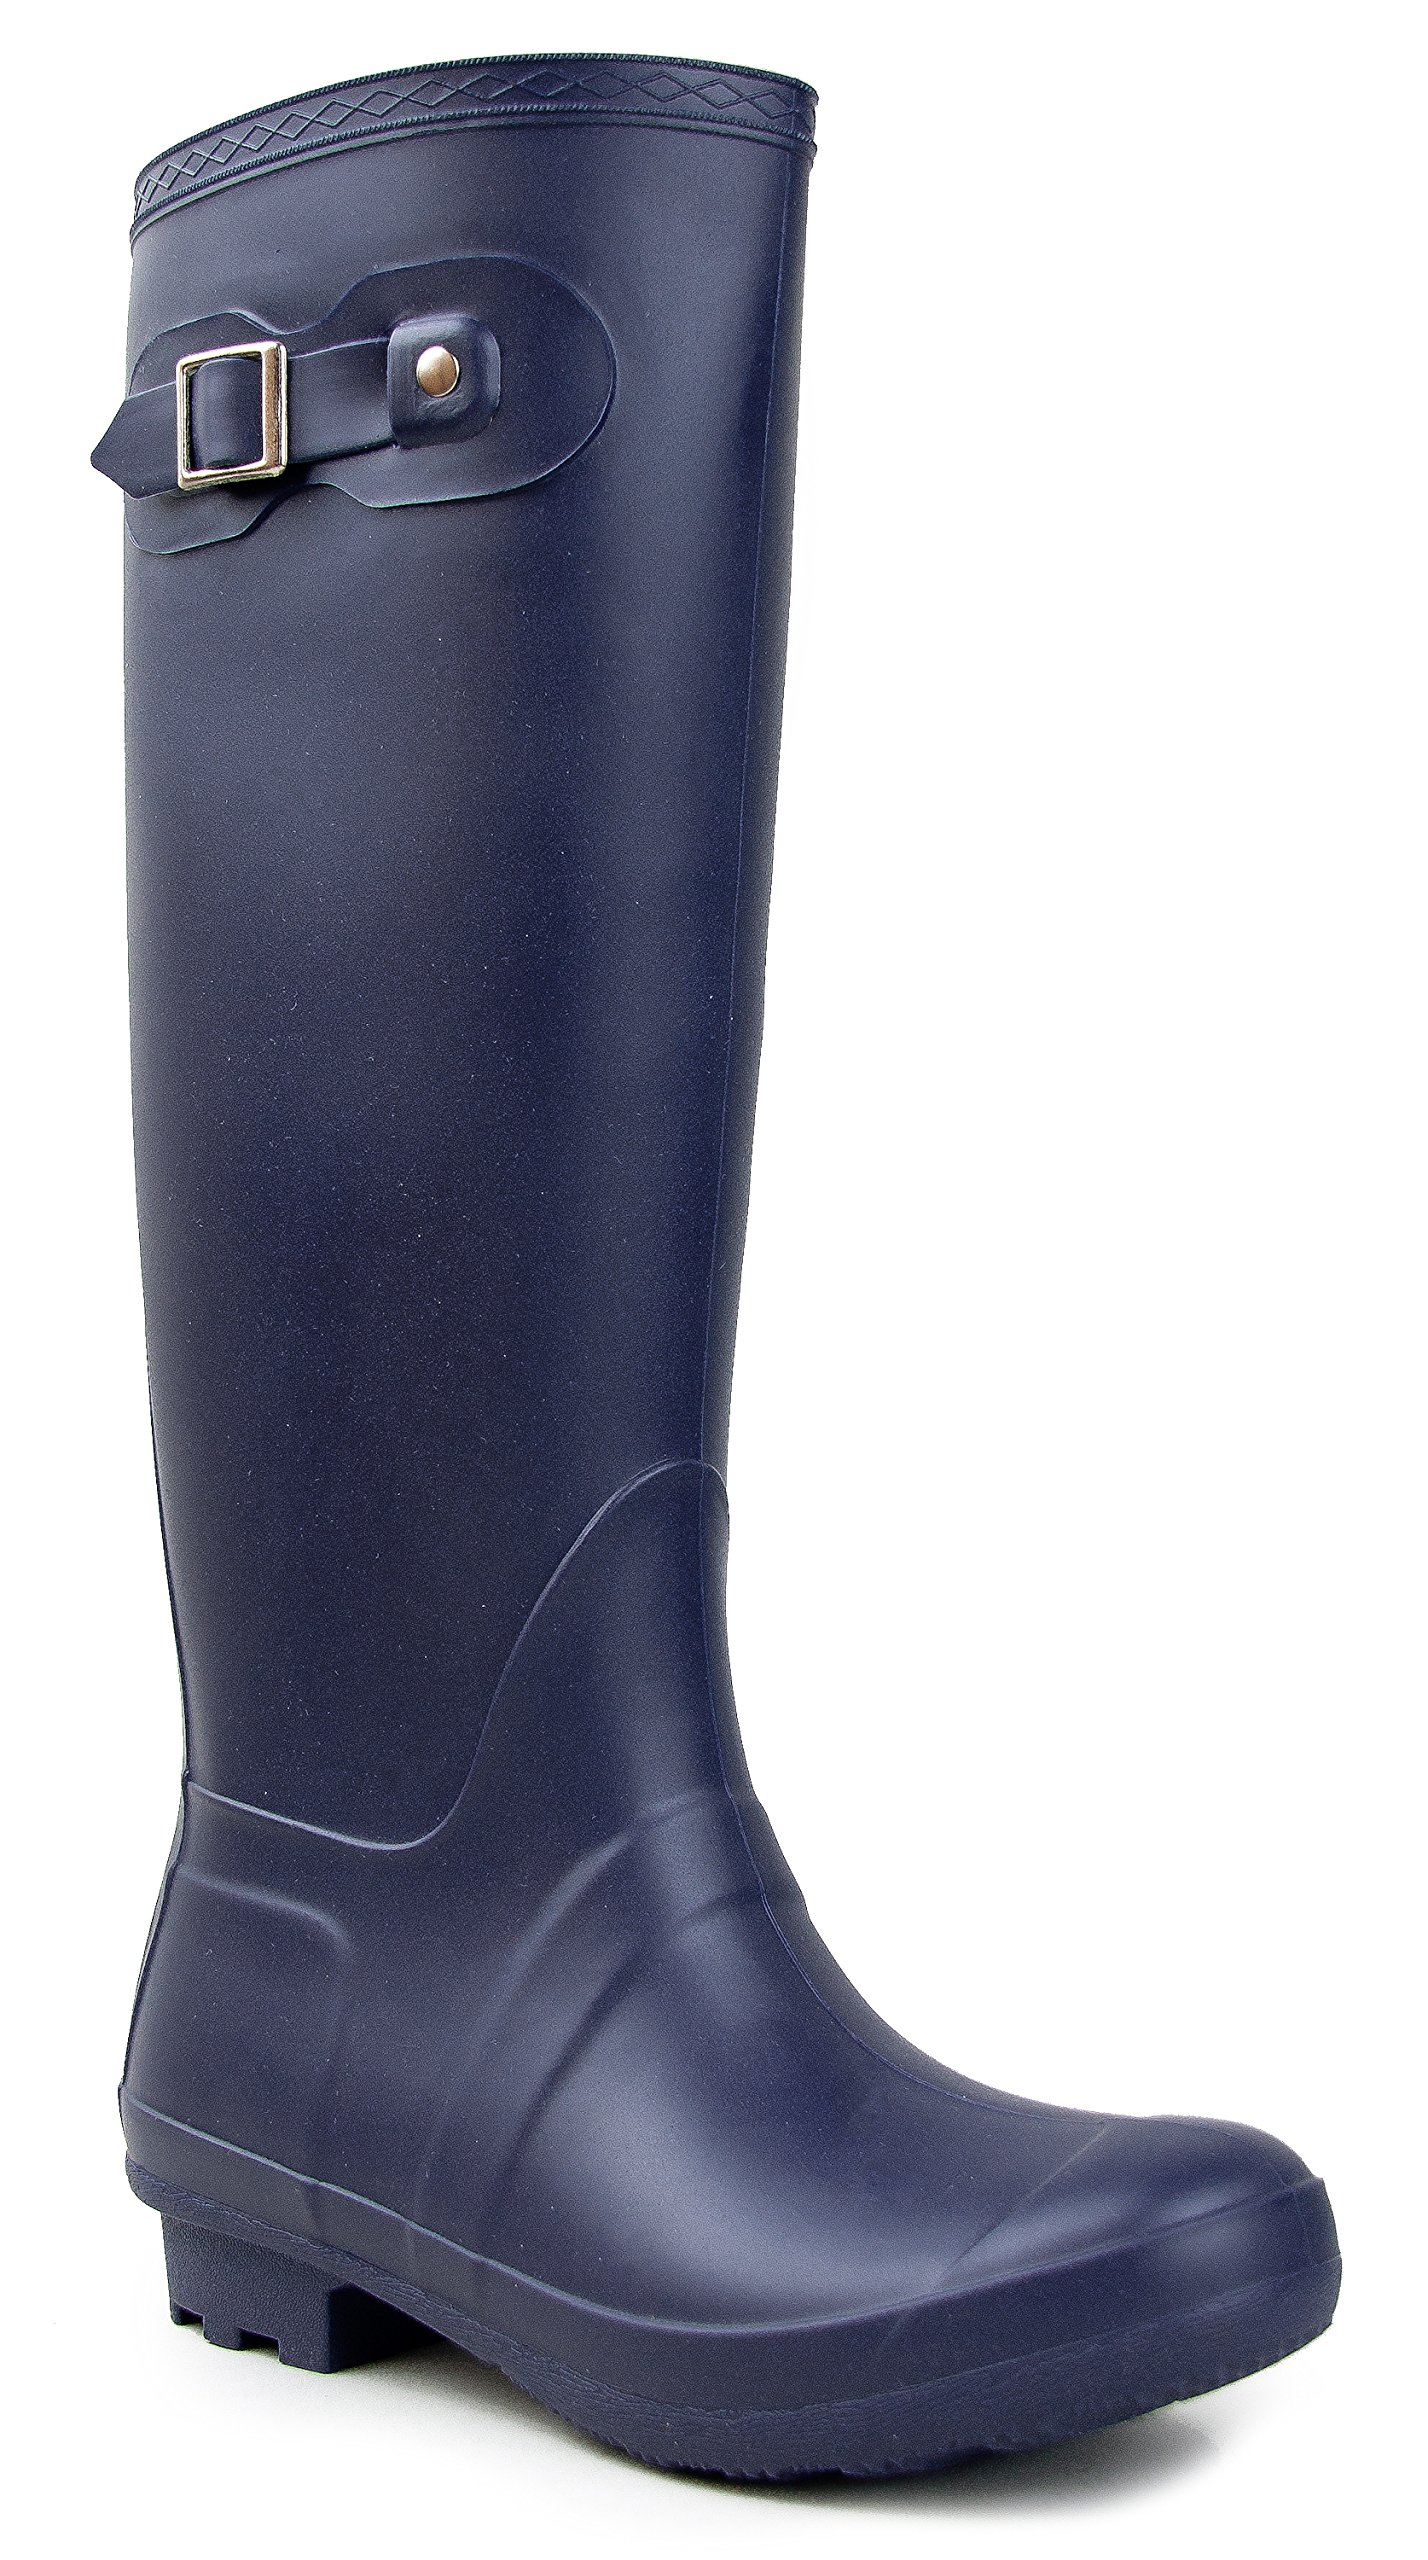 Classic Over the Knee High Rain Boot – Women's Welly Comfort Tall Mid Calf Rainboot - Weatherproof Shoe